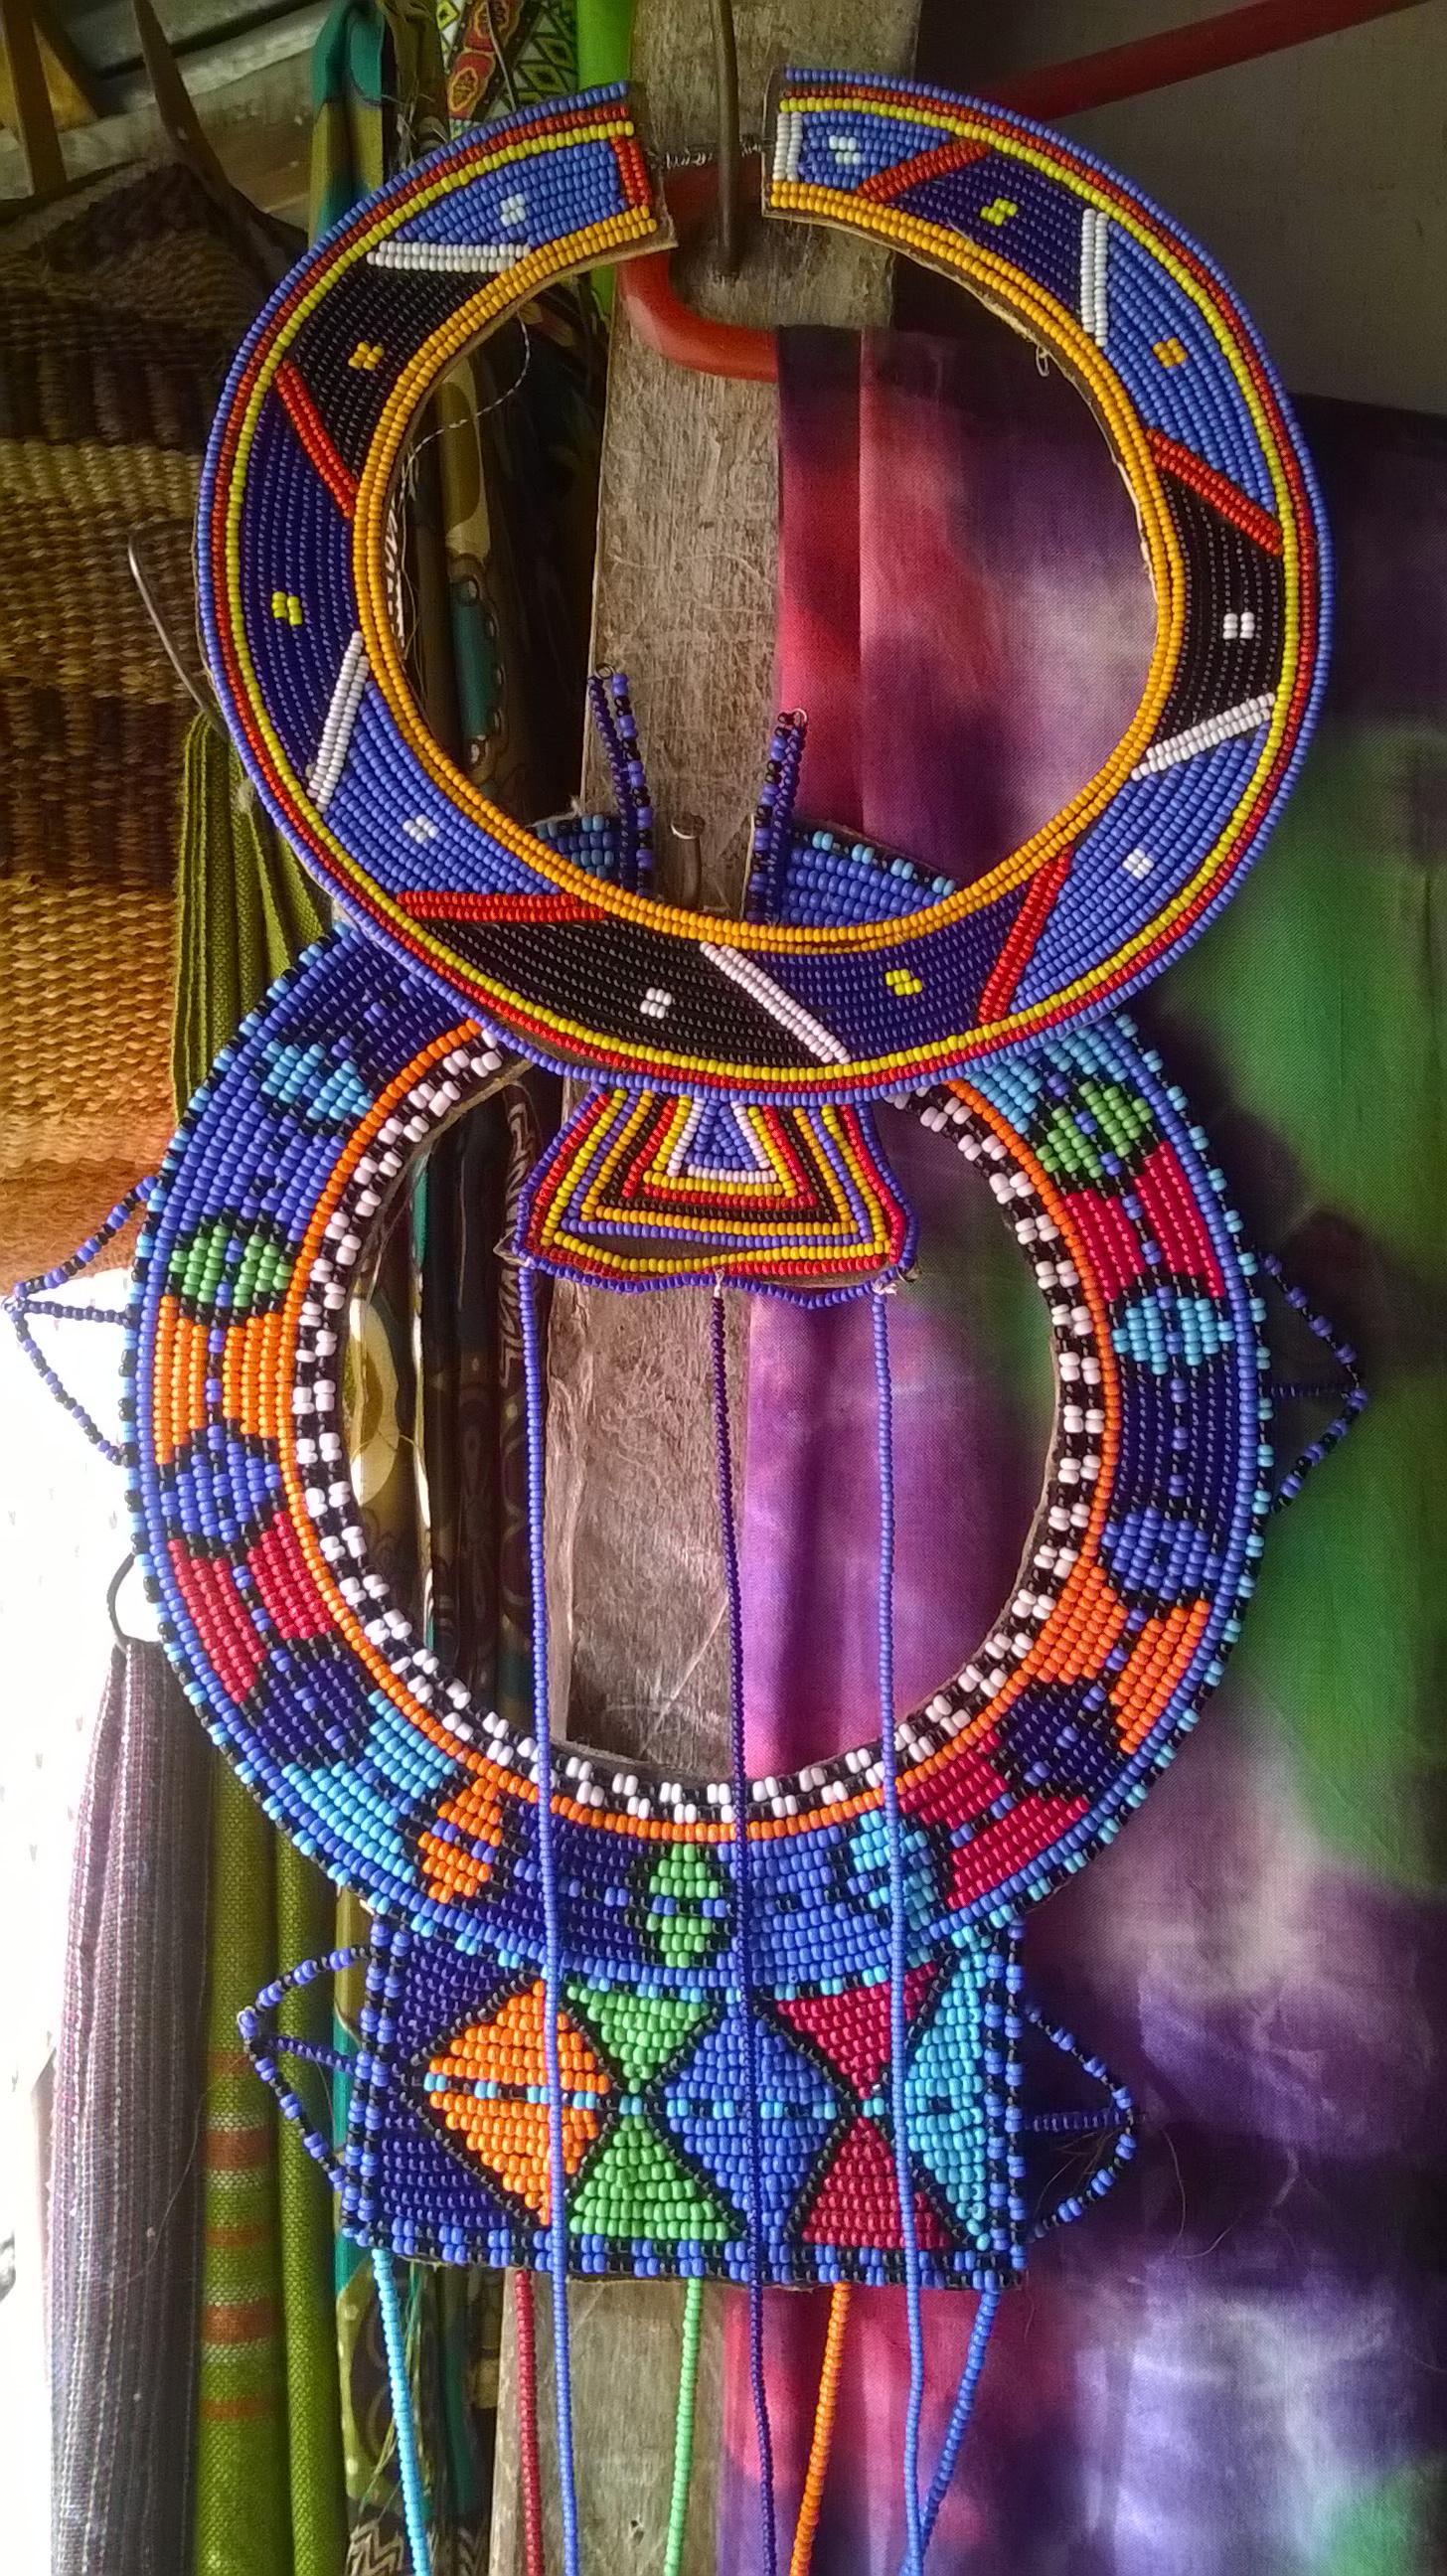 File:Traditional Maasai Jewelry. Triangle Curio Market